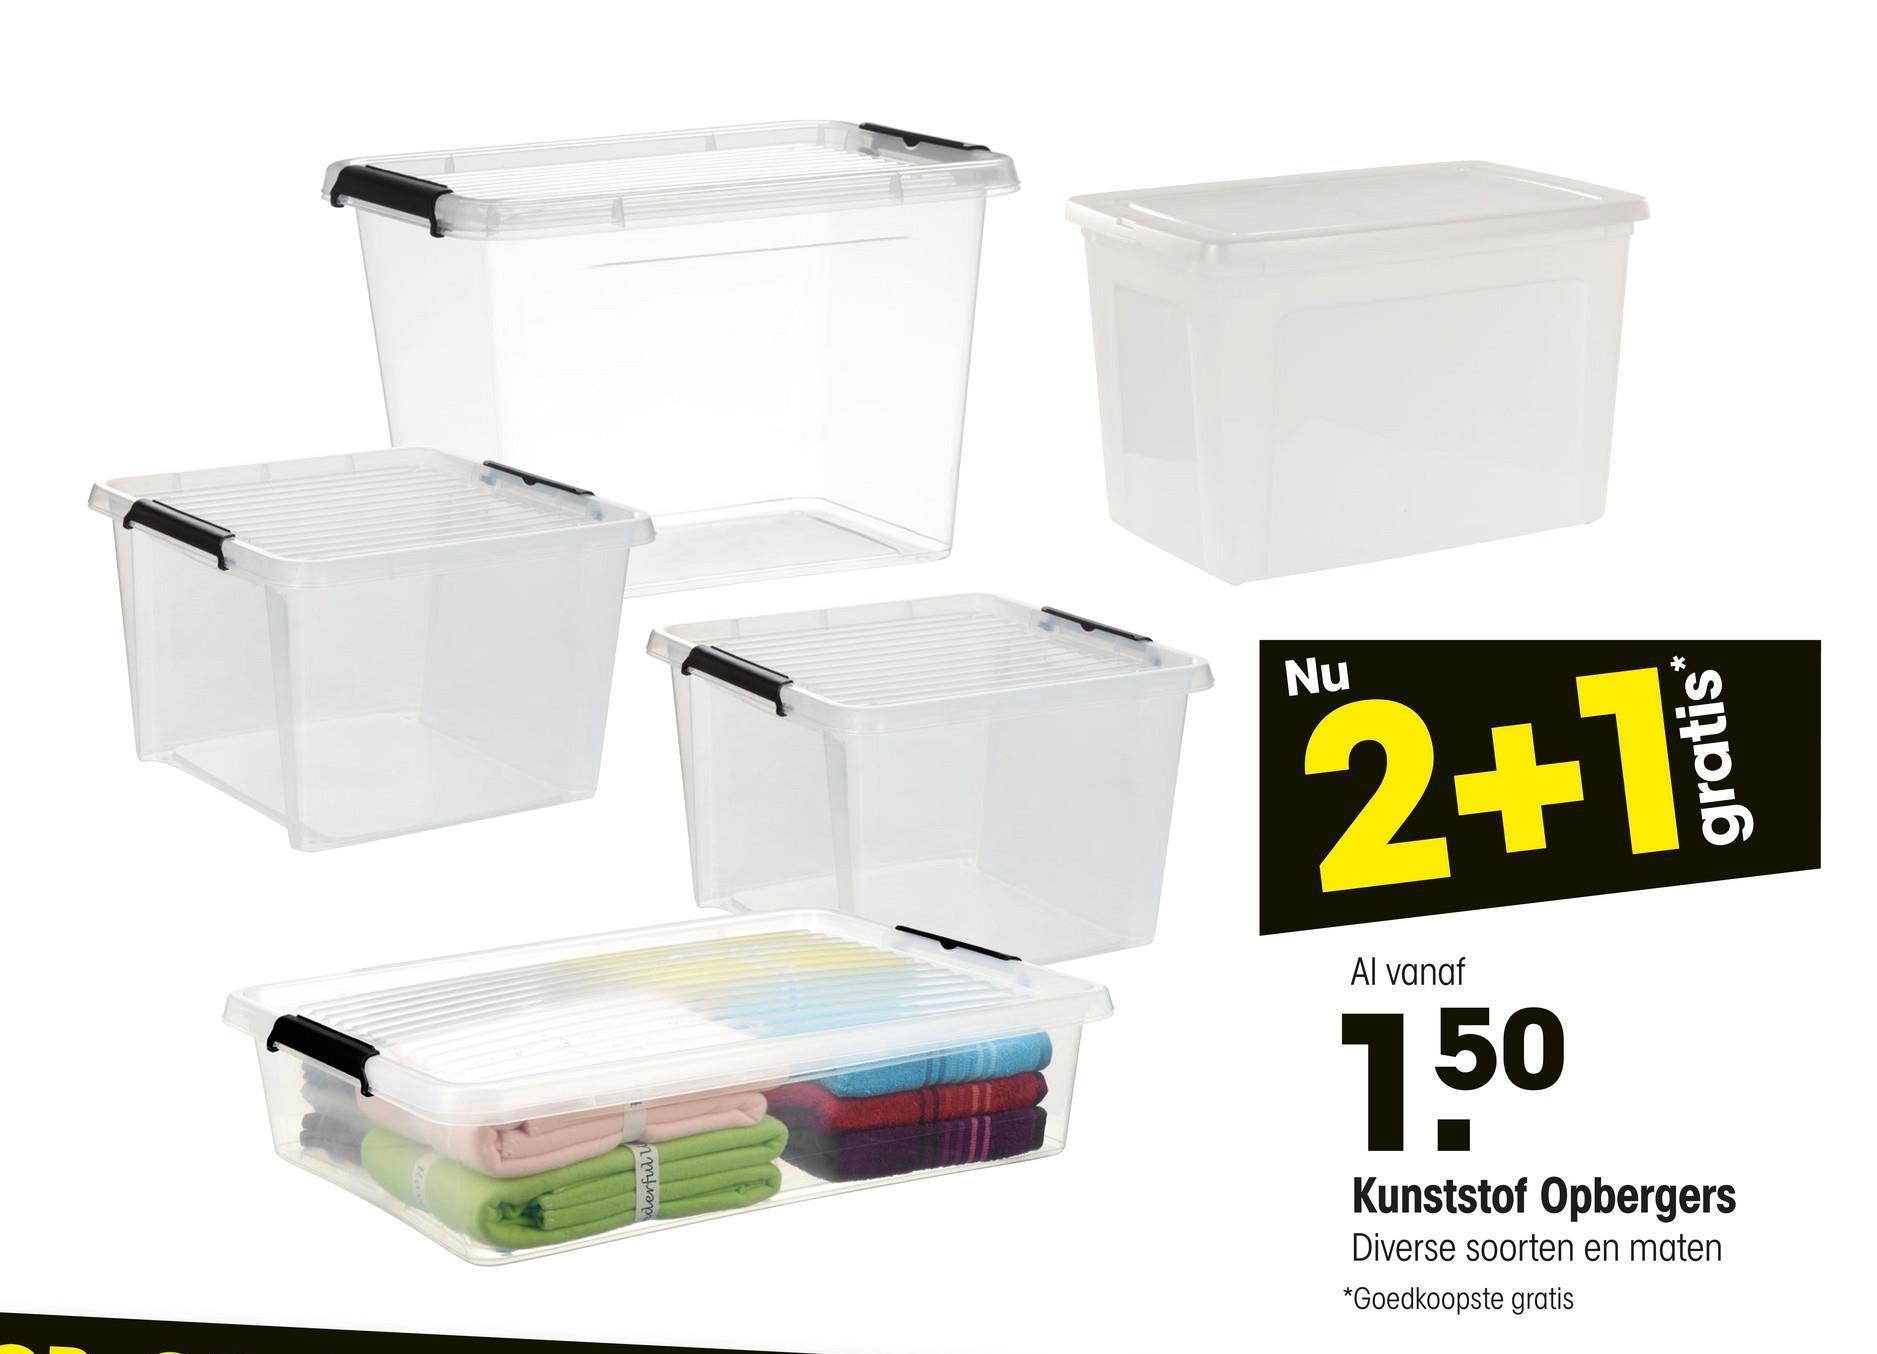 Opbergbox Handige kunststof opbergbox. Inhoud: 50 liter. Afmeting: 39,5x59,5x29 cm. (lxbxh).